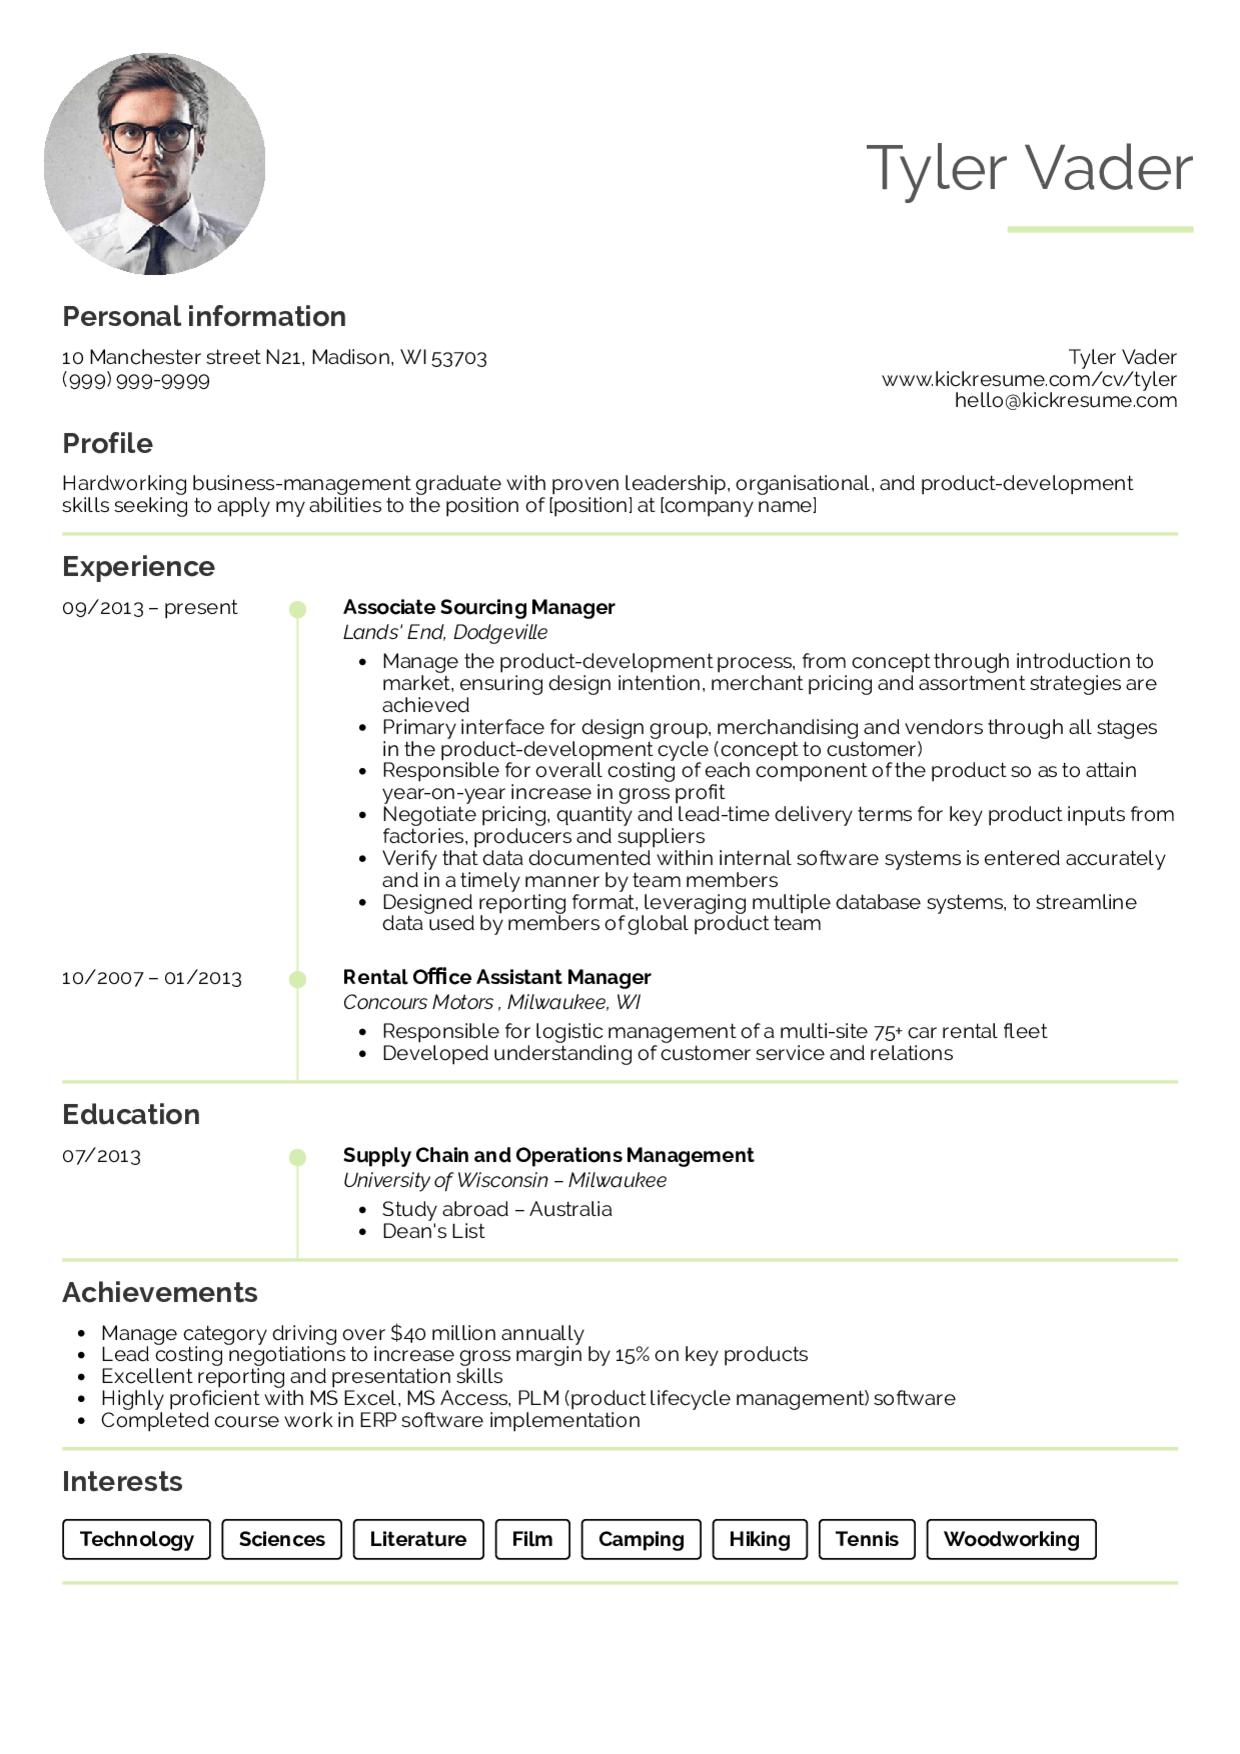 Resume Examples Business Resumeexamples Resume Examples Business Resume Template Business Management